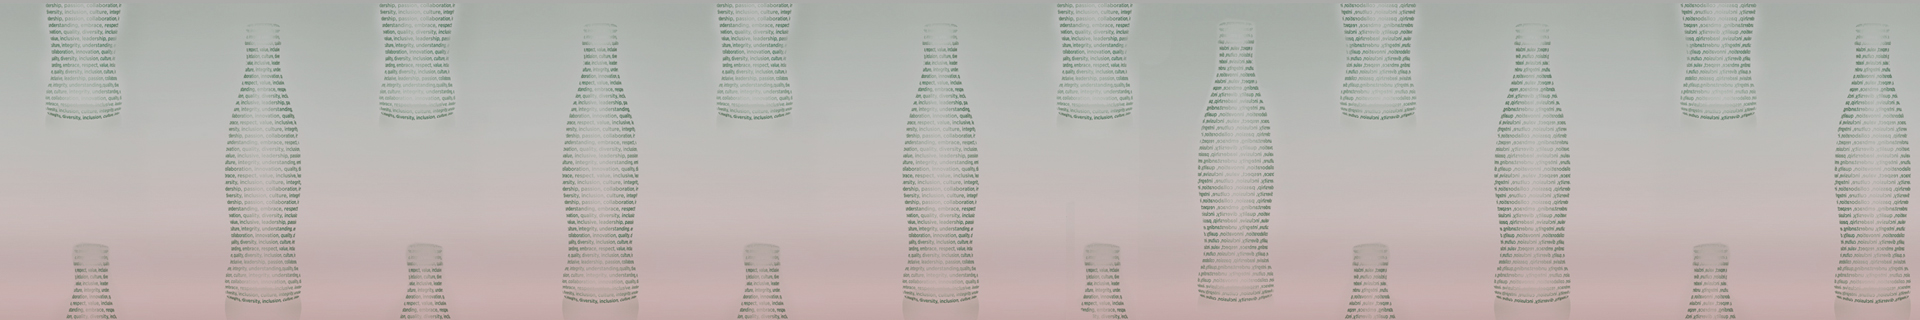 Coca-Cola y Ta-Ta te invitan a traer tu carta para Papá Noel